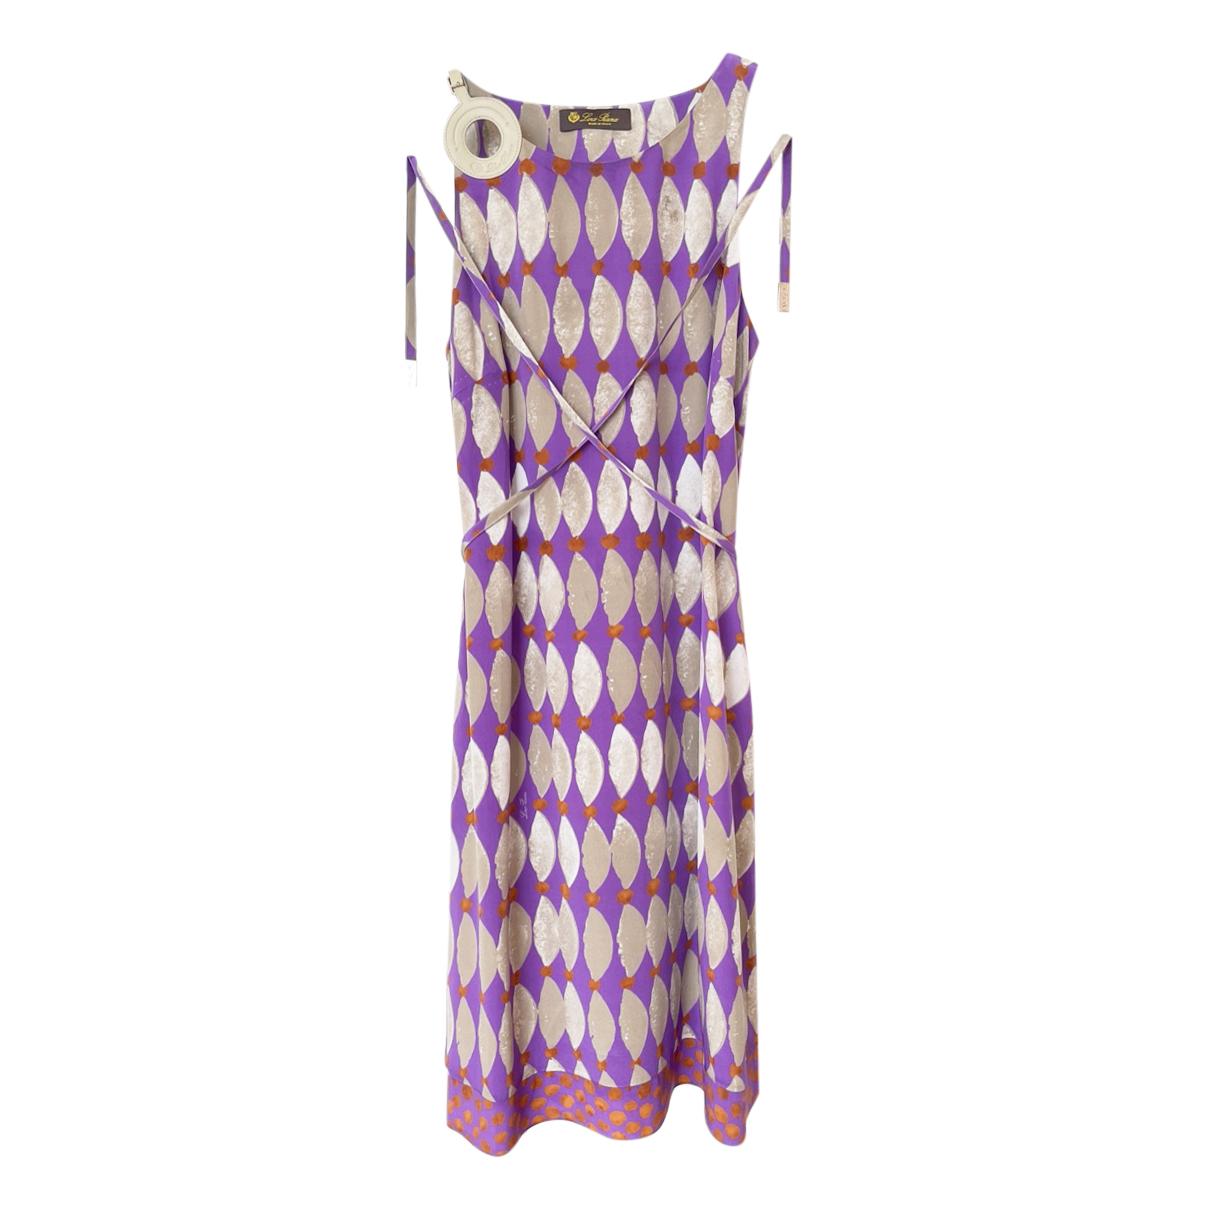 Loro Piana Leather Trim Silk Printed Dress